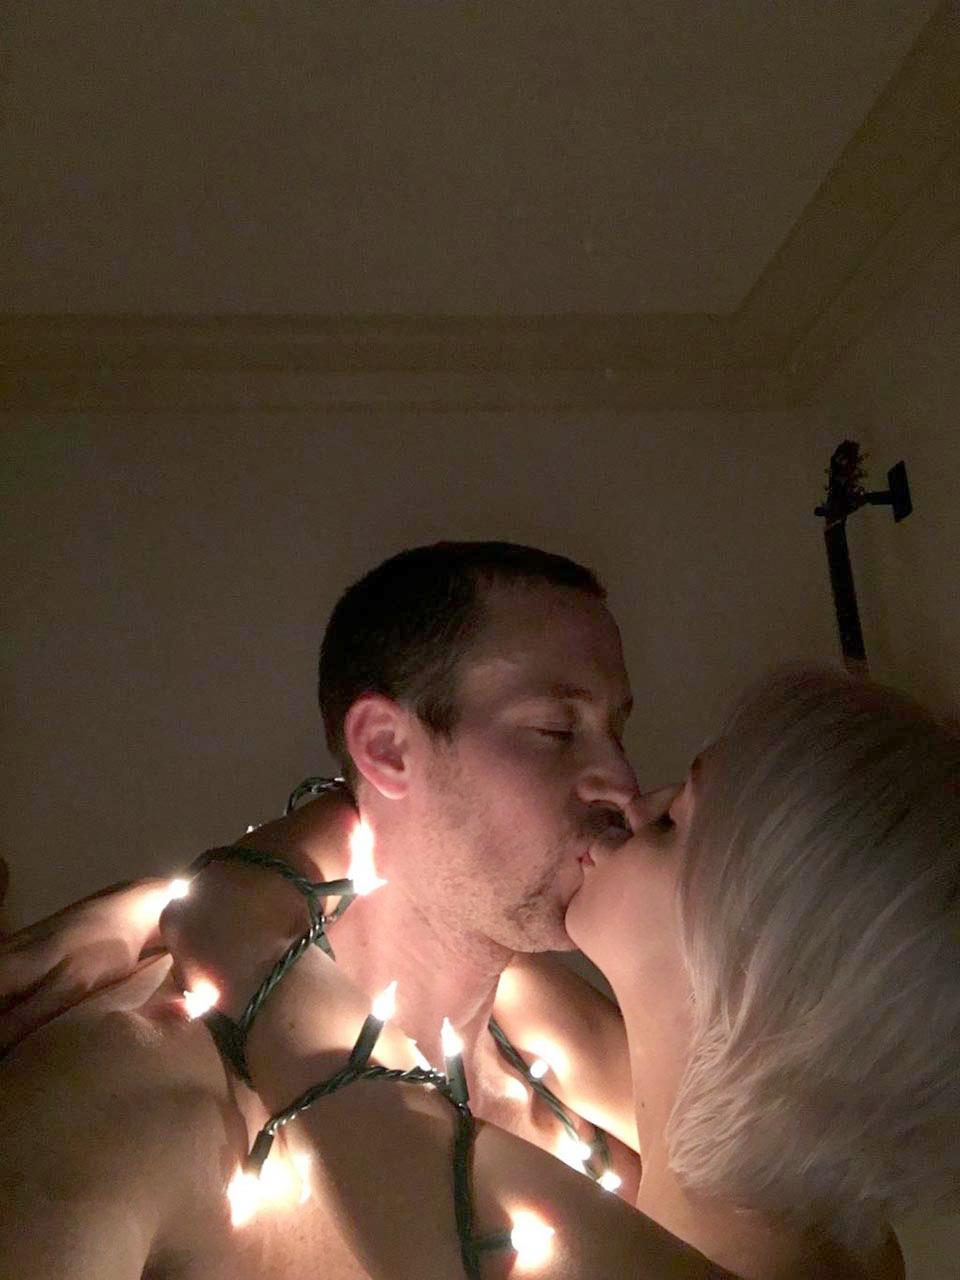 Britni Sheridan leaked nude and masturbation photos The Fappening